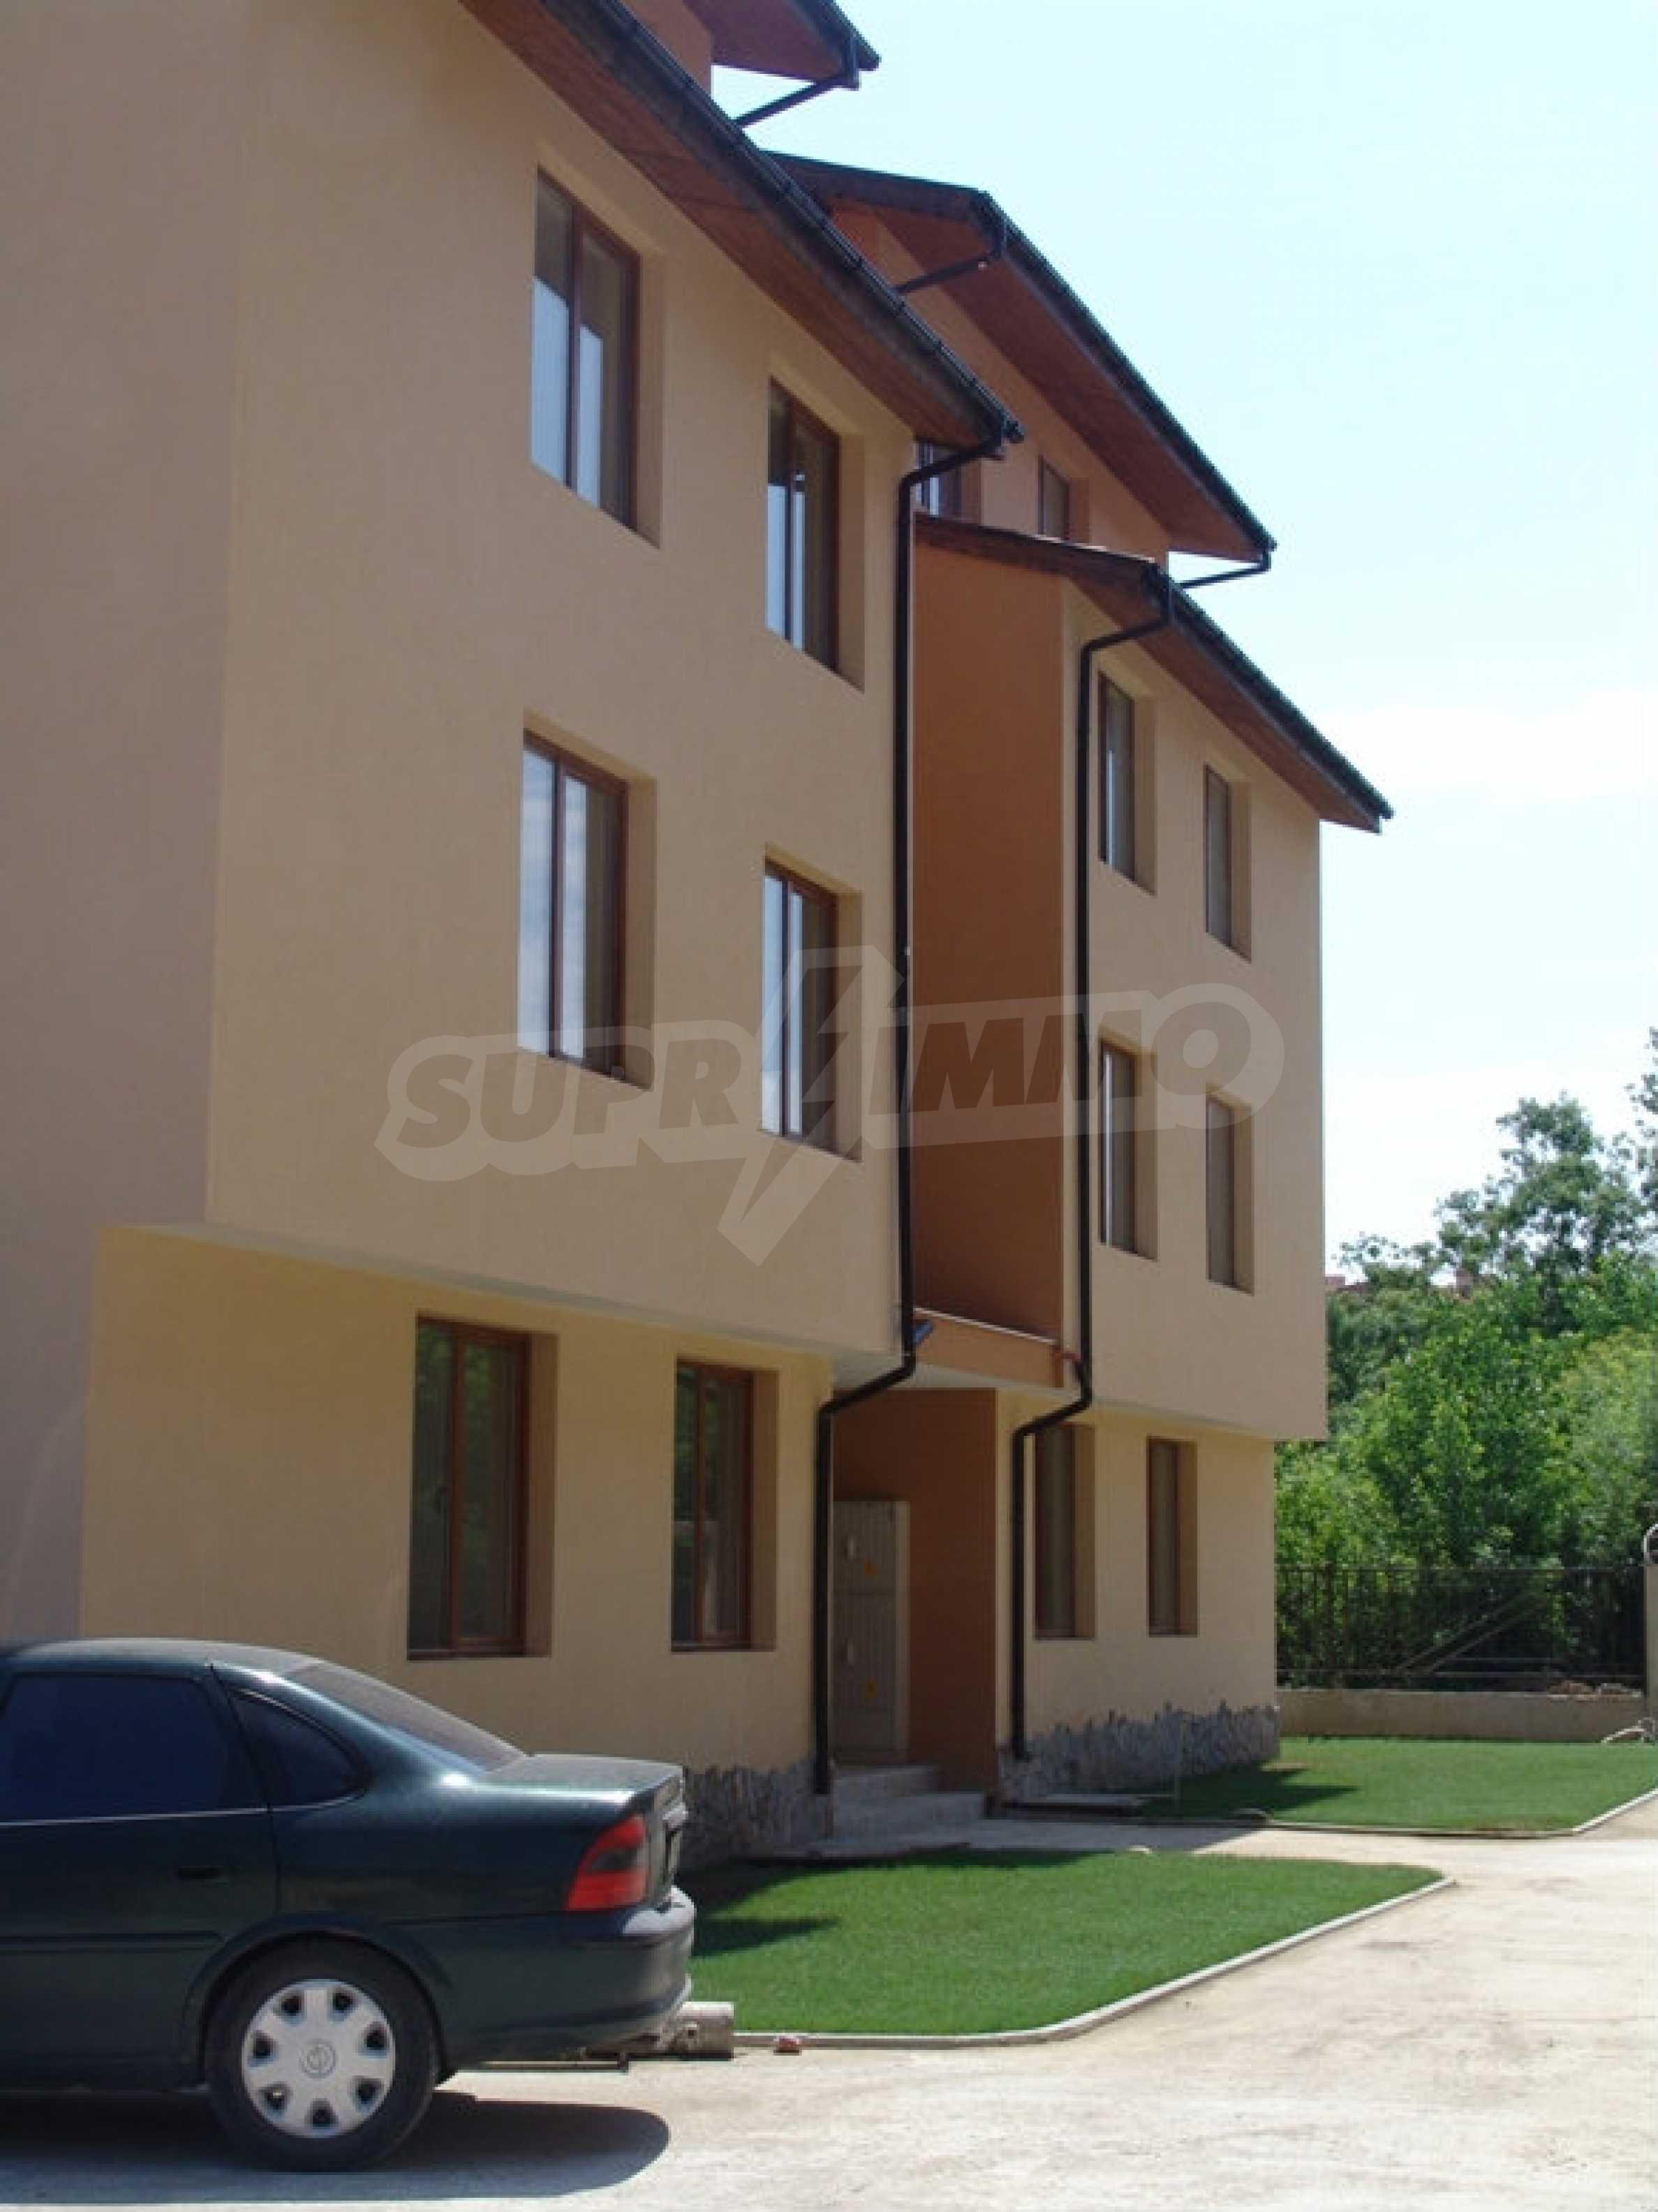 Studios und Apartments im Nestinarka-Komplex in Tsarevo 8